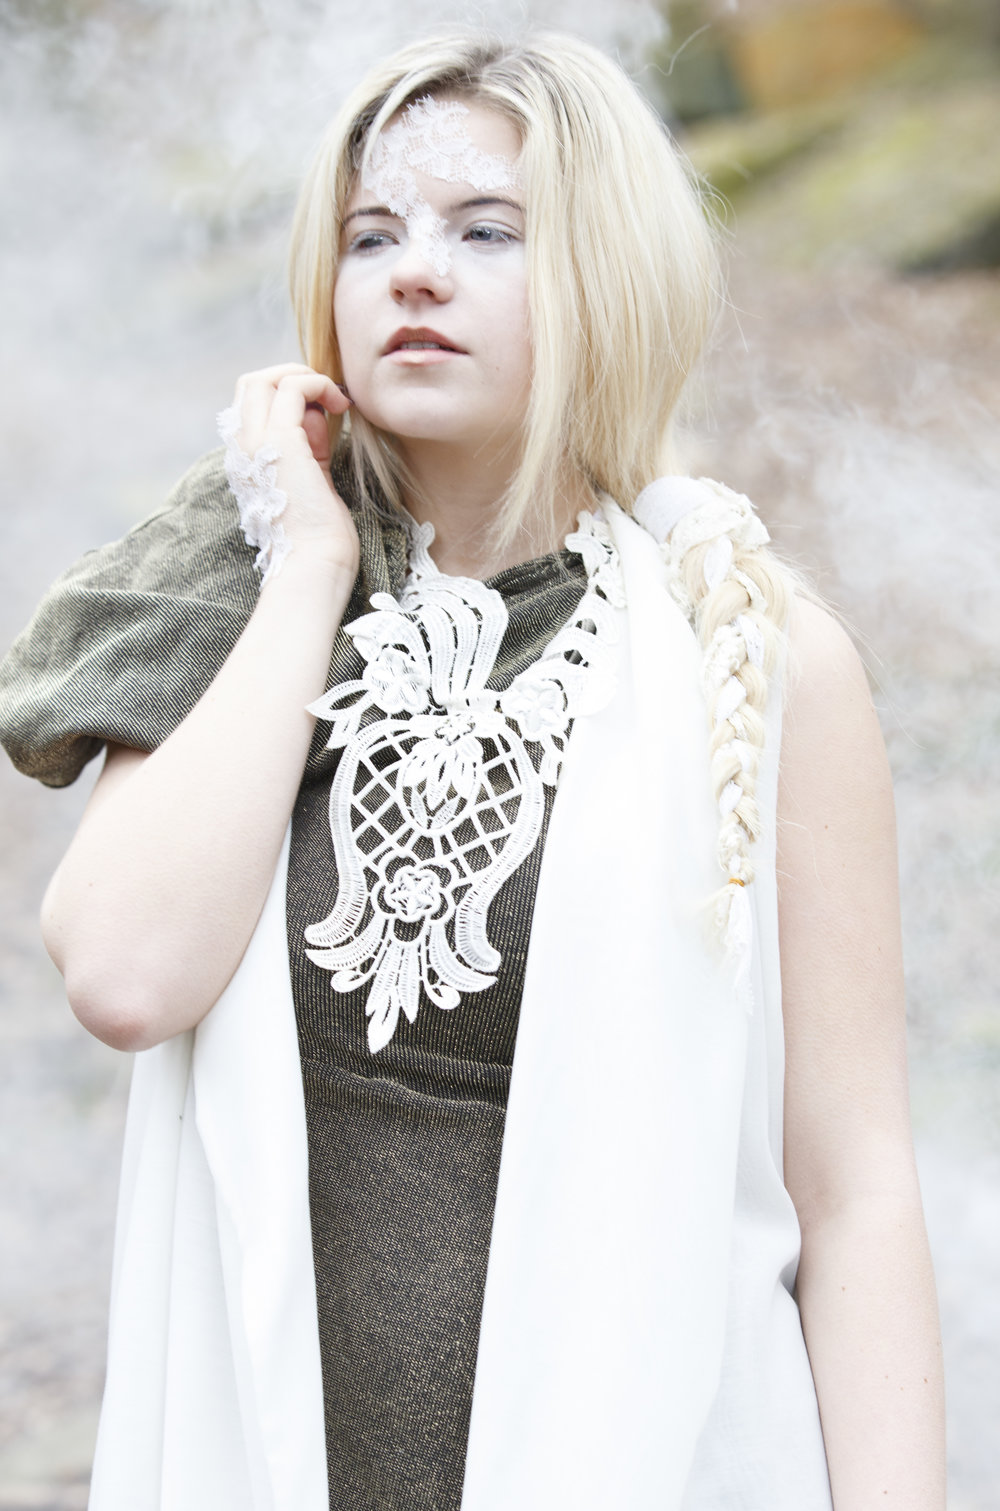 zaramia-ava-zaramiaava-leeds-fashion-designer-ethical-sustainable-smoke-versatile-drape-wrap-gold-cowl-white-dress-styling-location-womenswear-models-photoshoot-location-lace-1